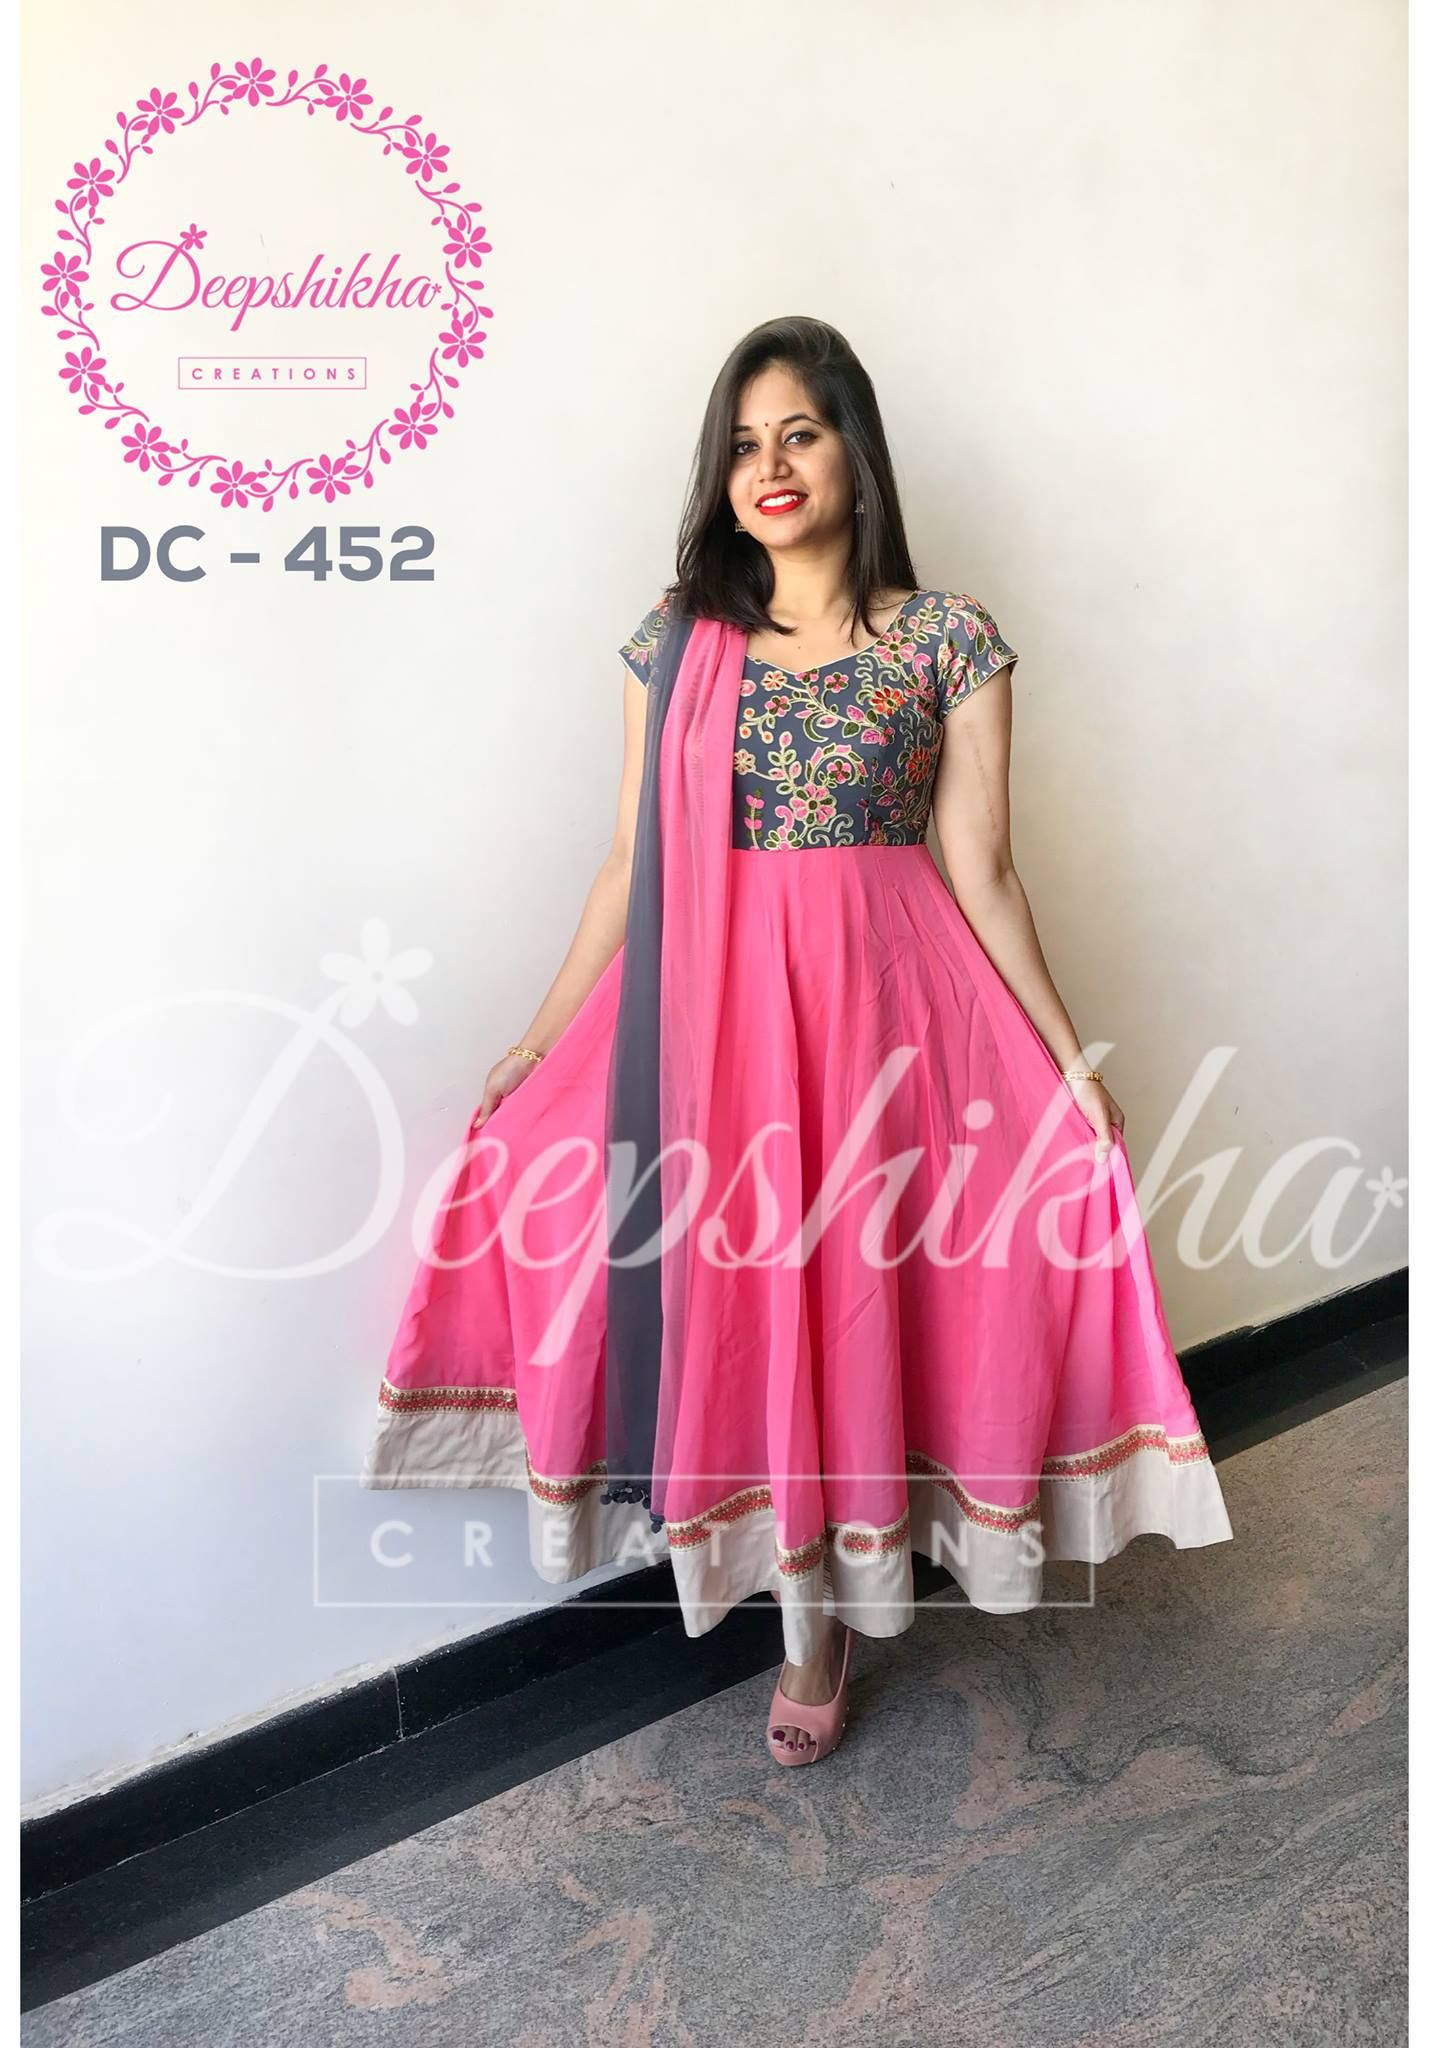 dbba729337697d Deepshikha Creations. Contact   090596 83293. Email    deepshikhacreations gmail.com.